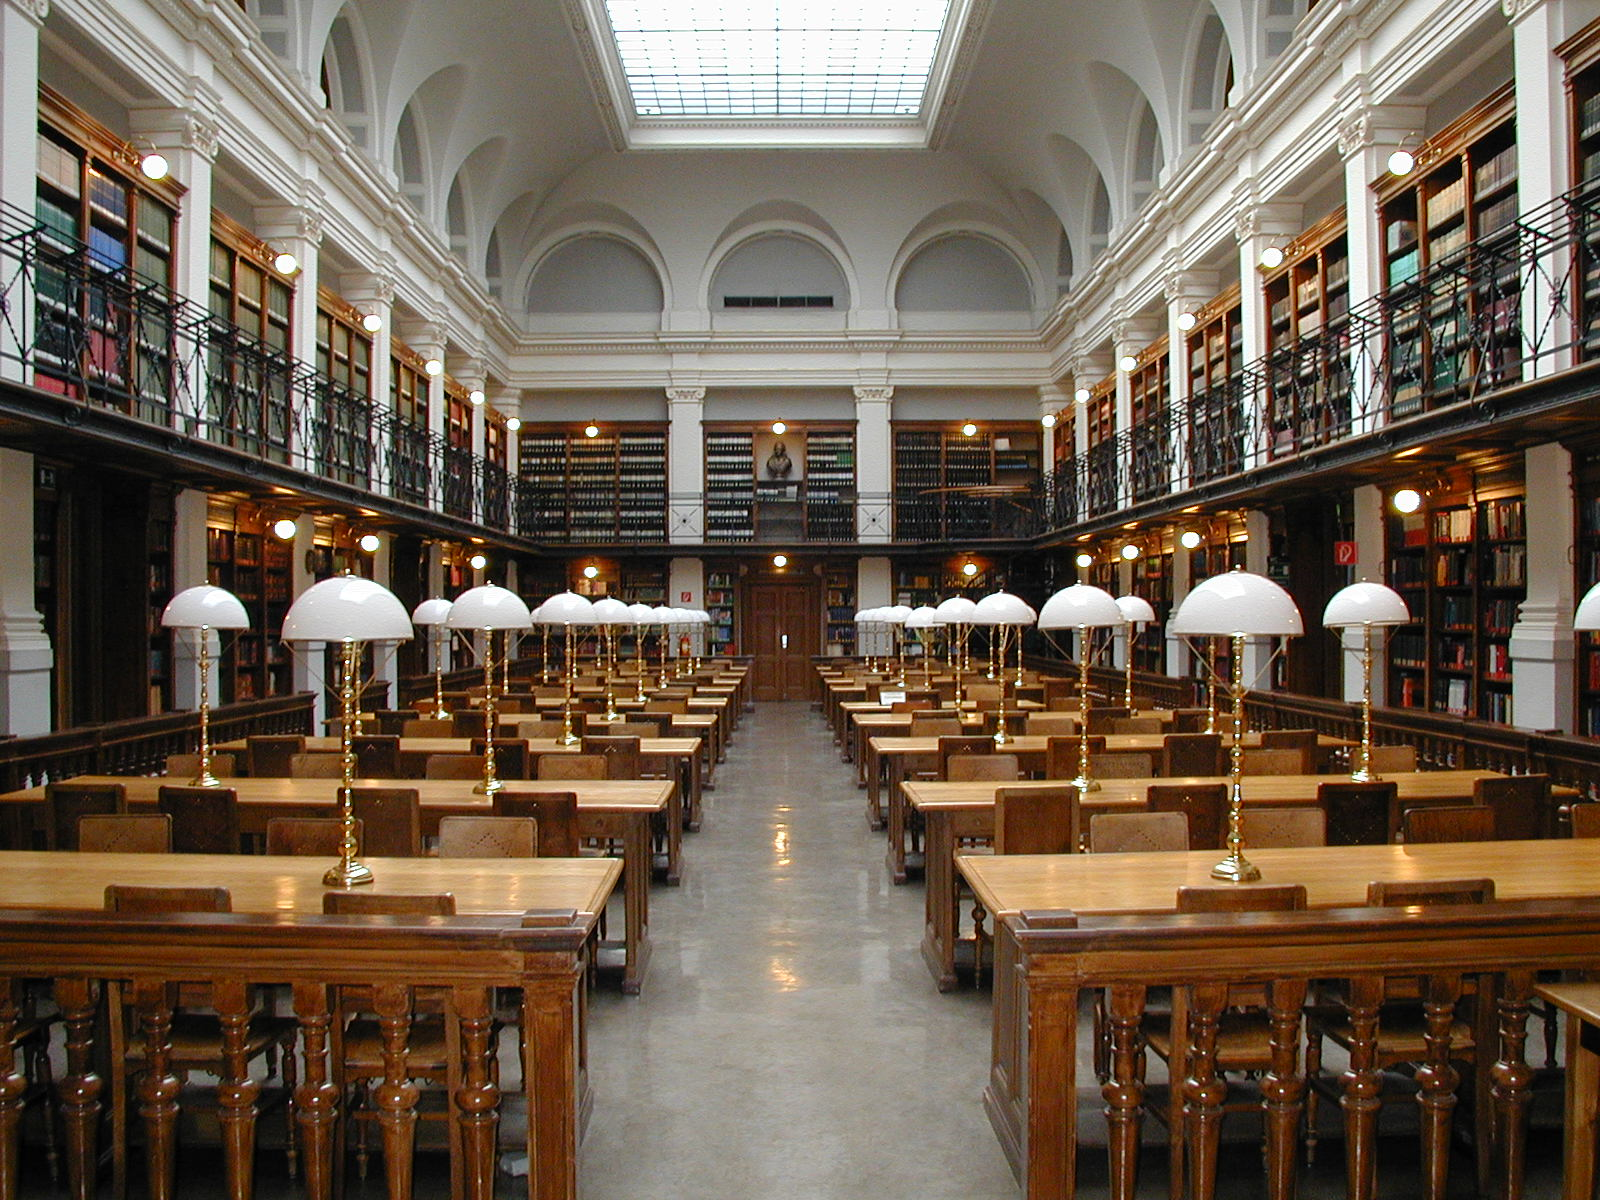 Библиотека — лучшая альтернатива коворкингу!